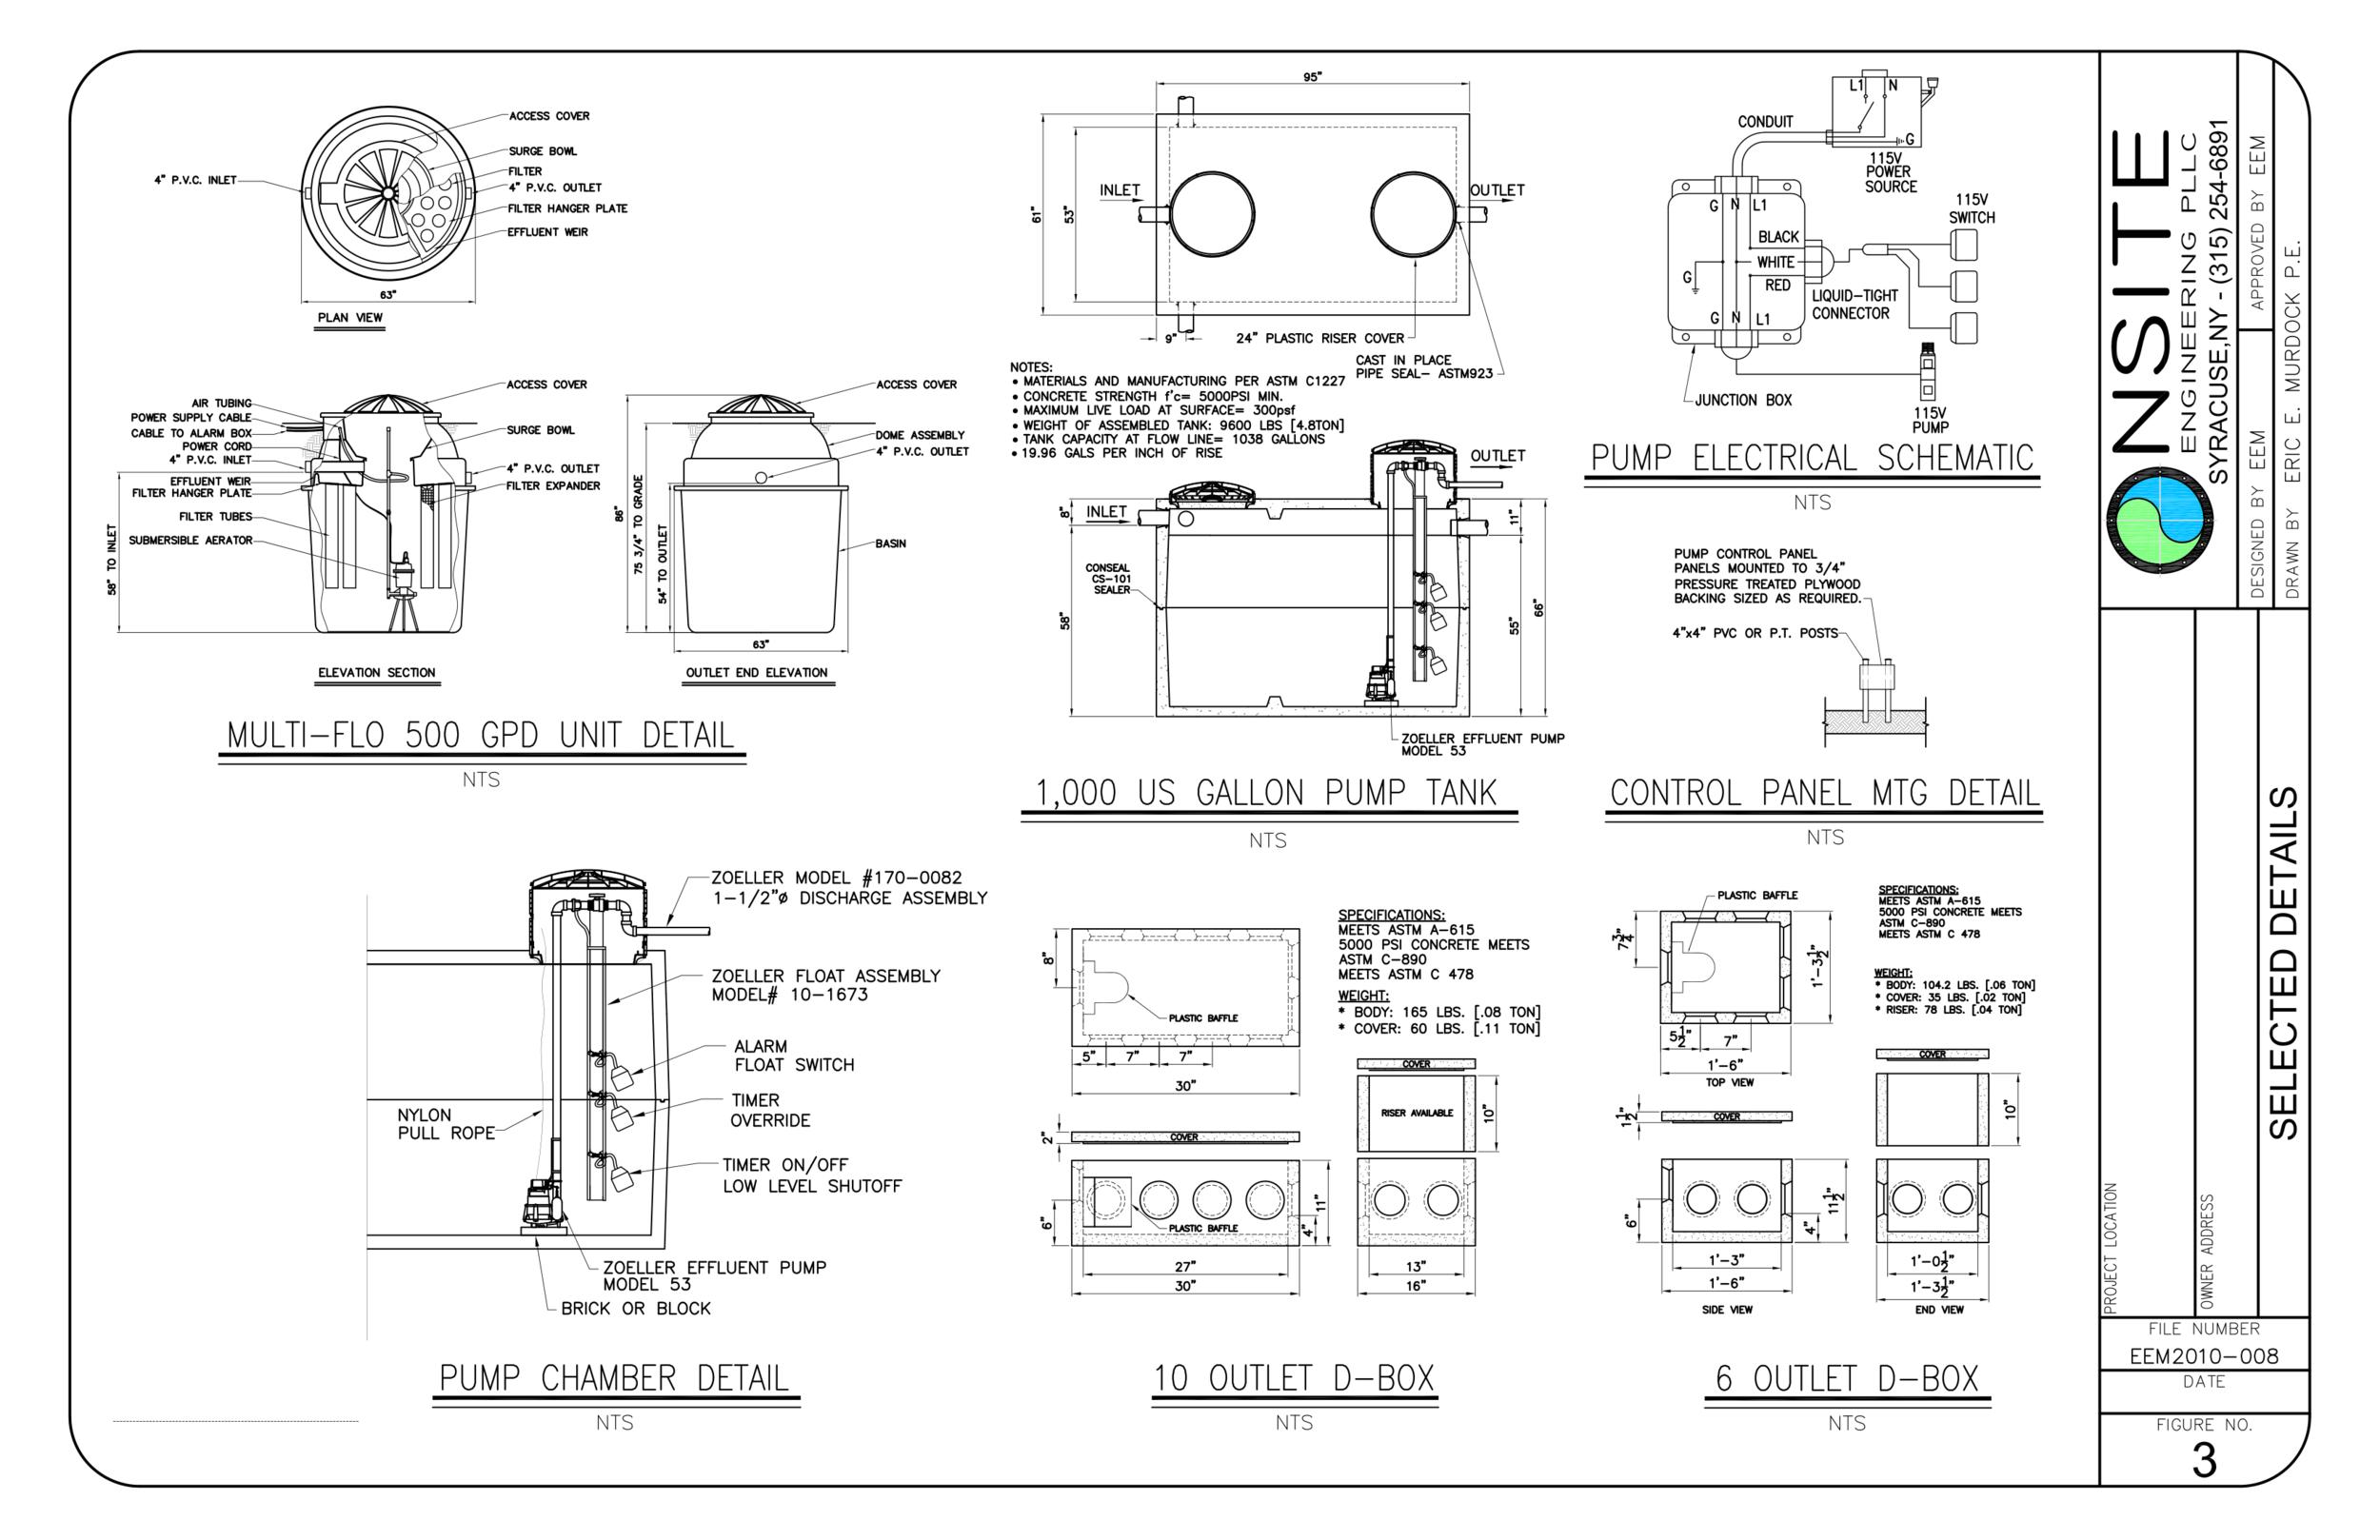 Pump Station / Distribution Box Details